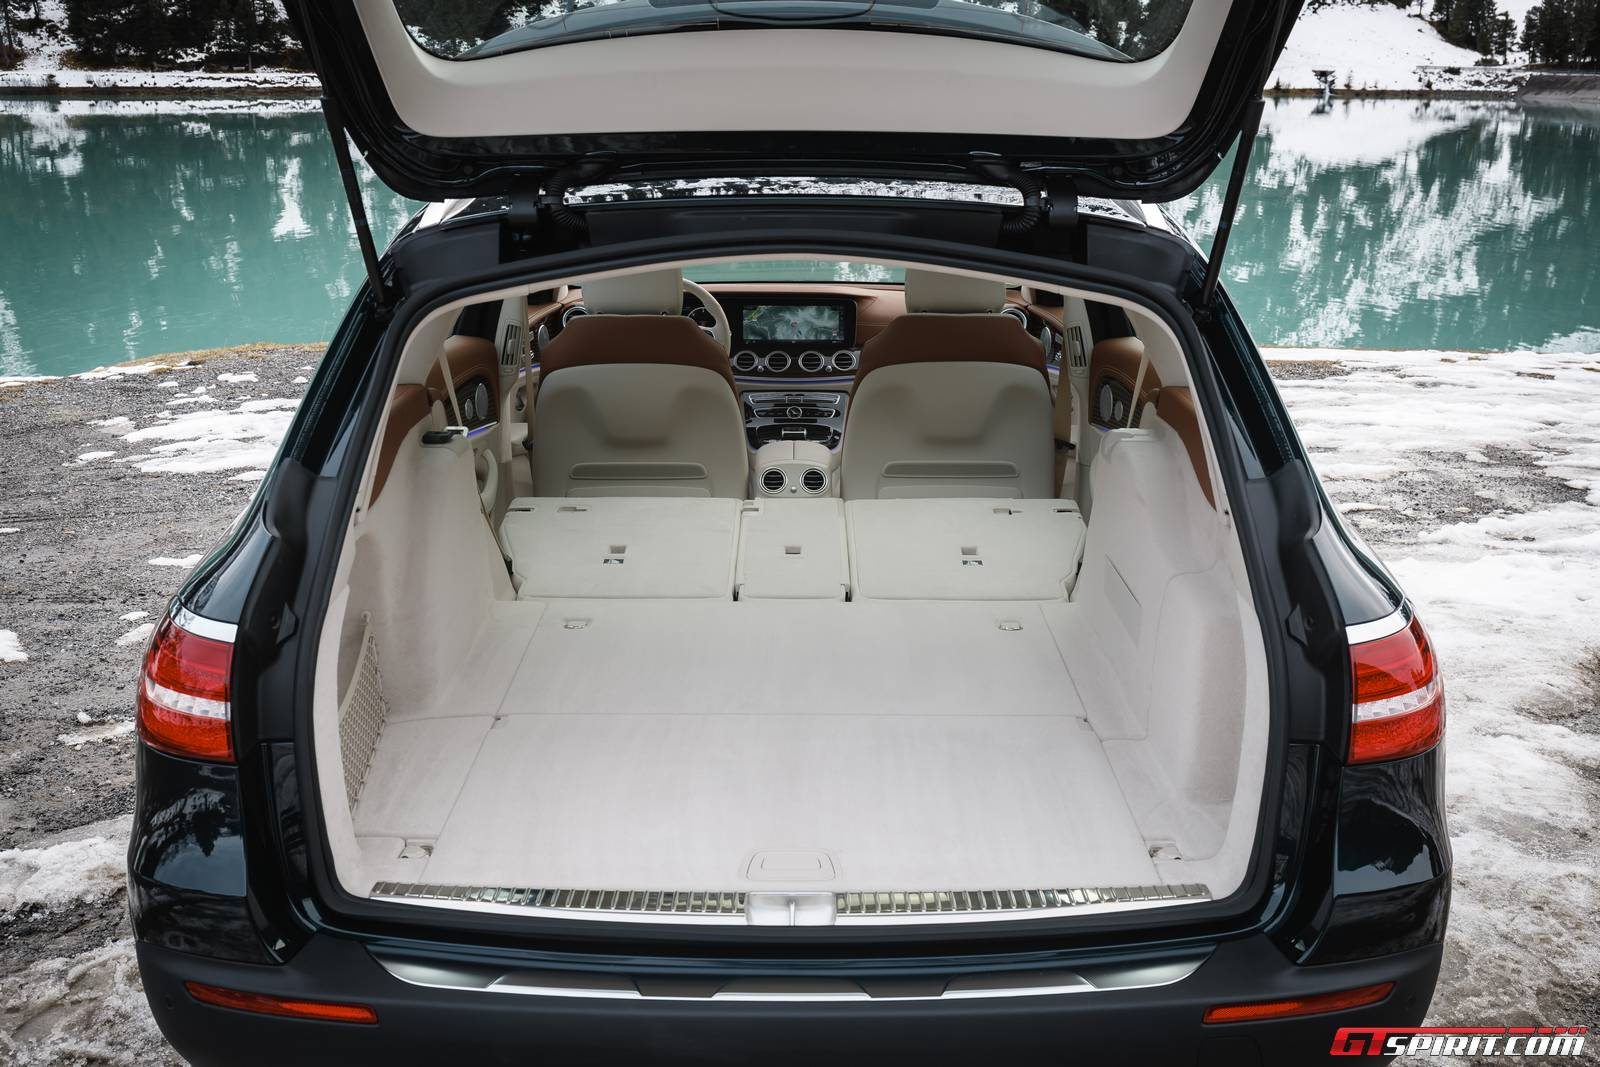 2017 mercedes benz e class all terrain review gtspirit for How to open the trunk of a mercedes benz e320